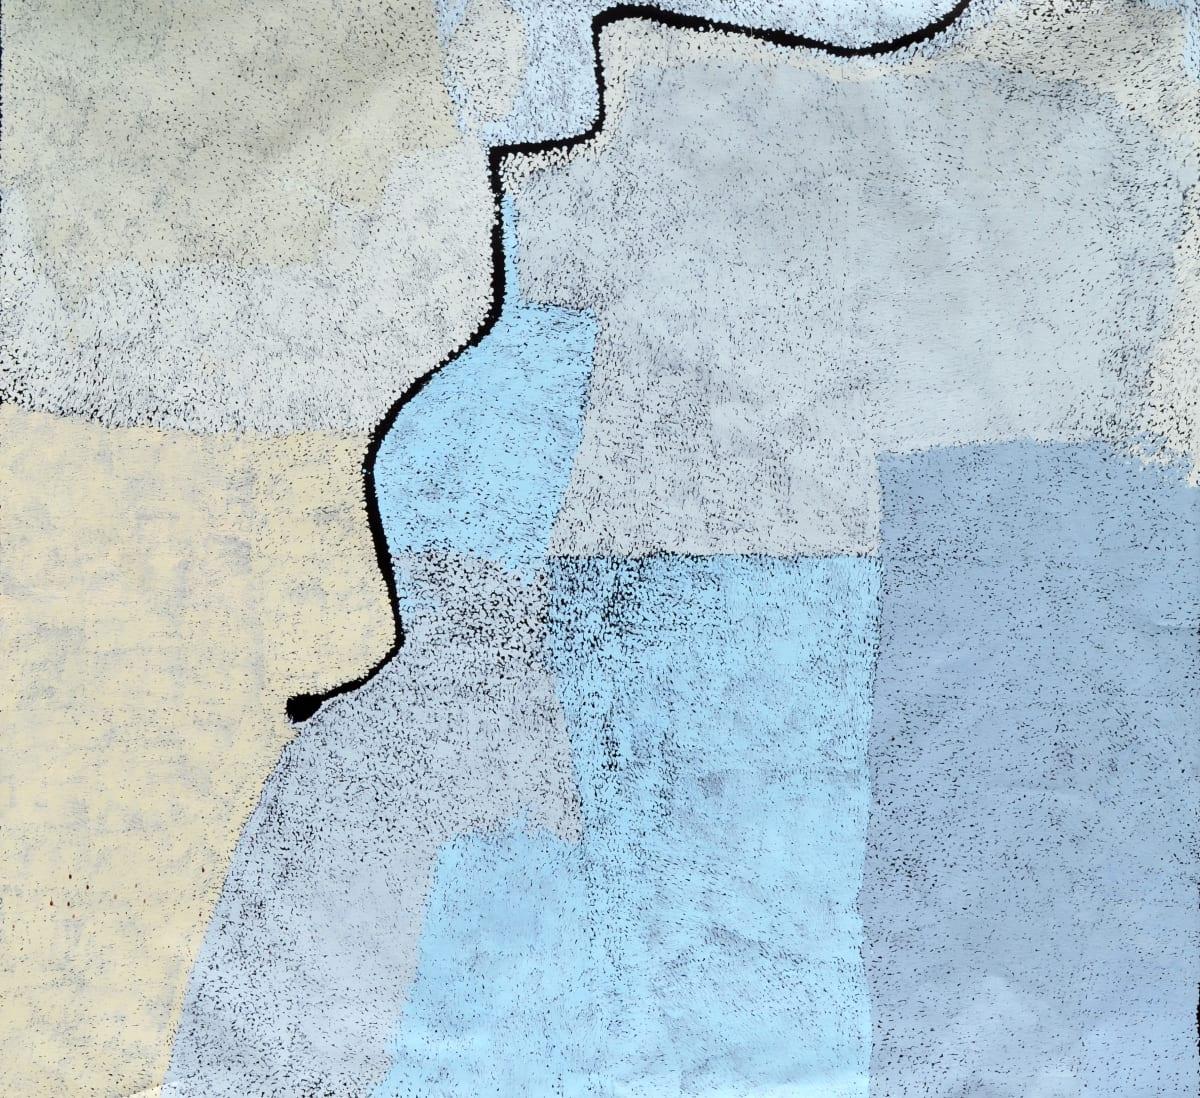 Pepai Jangala Carroll Walungurru acrylic on linen 178 x 180 cm